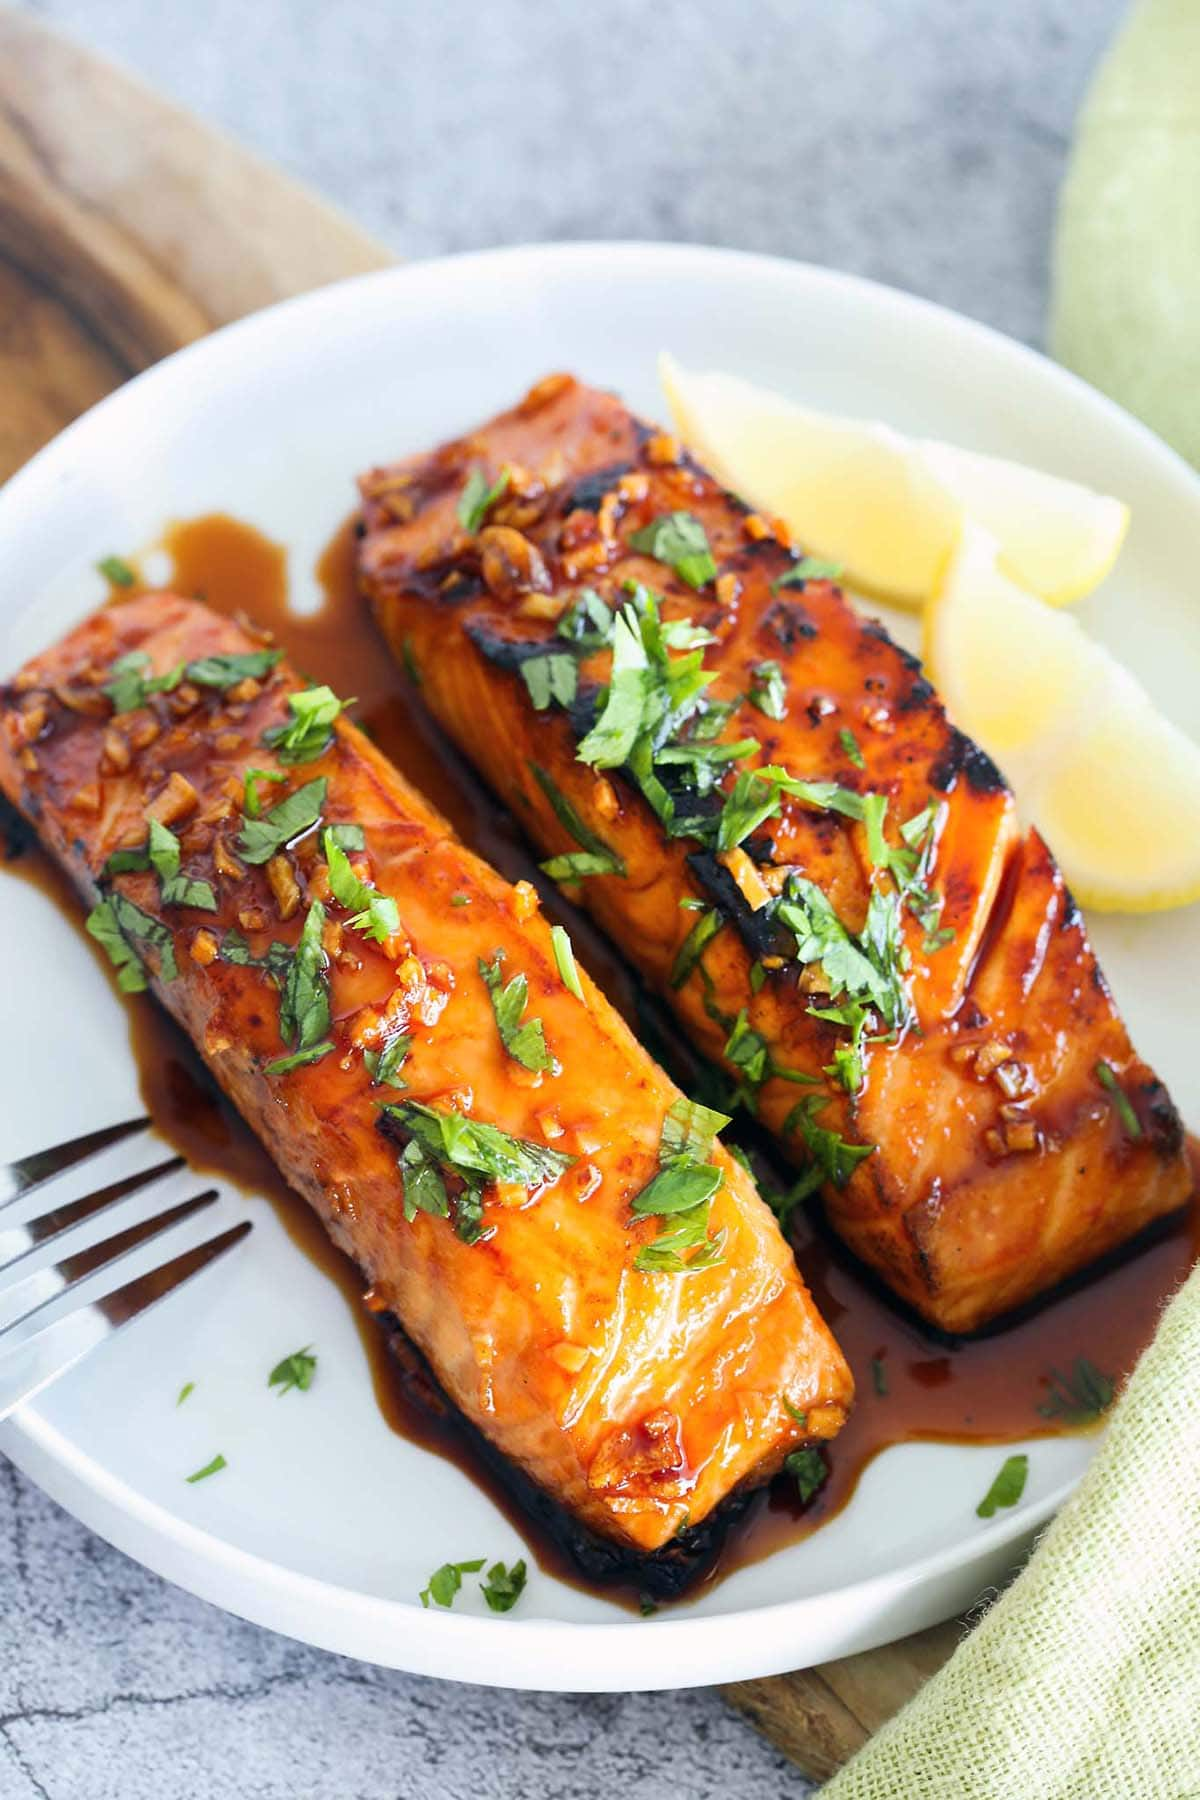 Honey glazed salmon with sriracha.